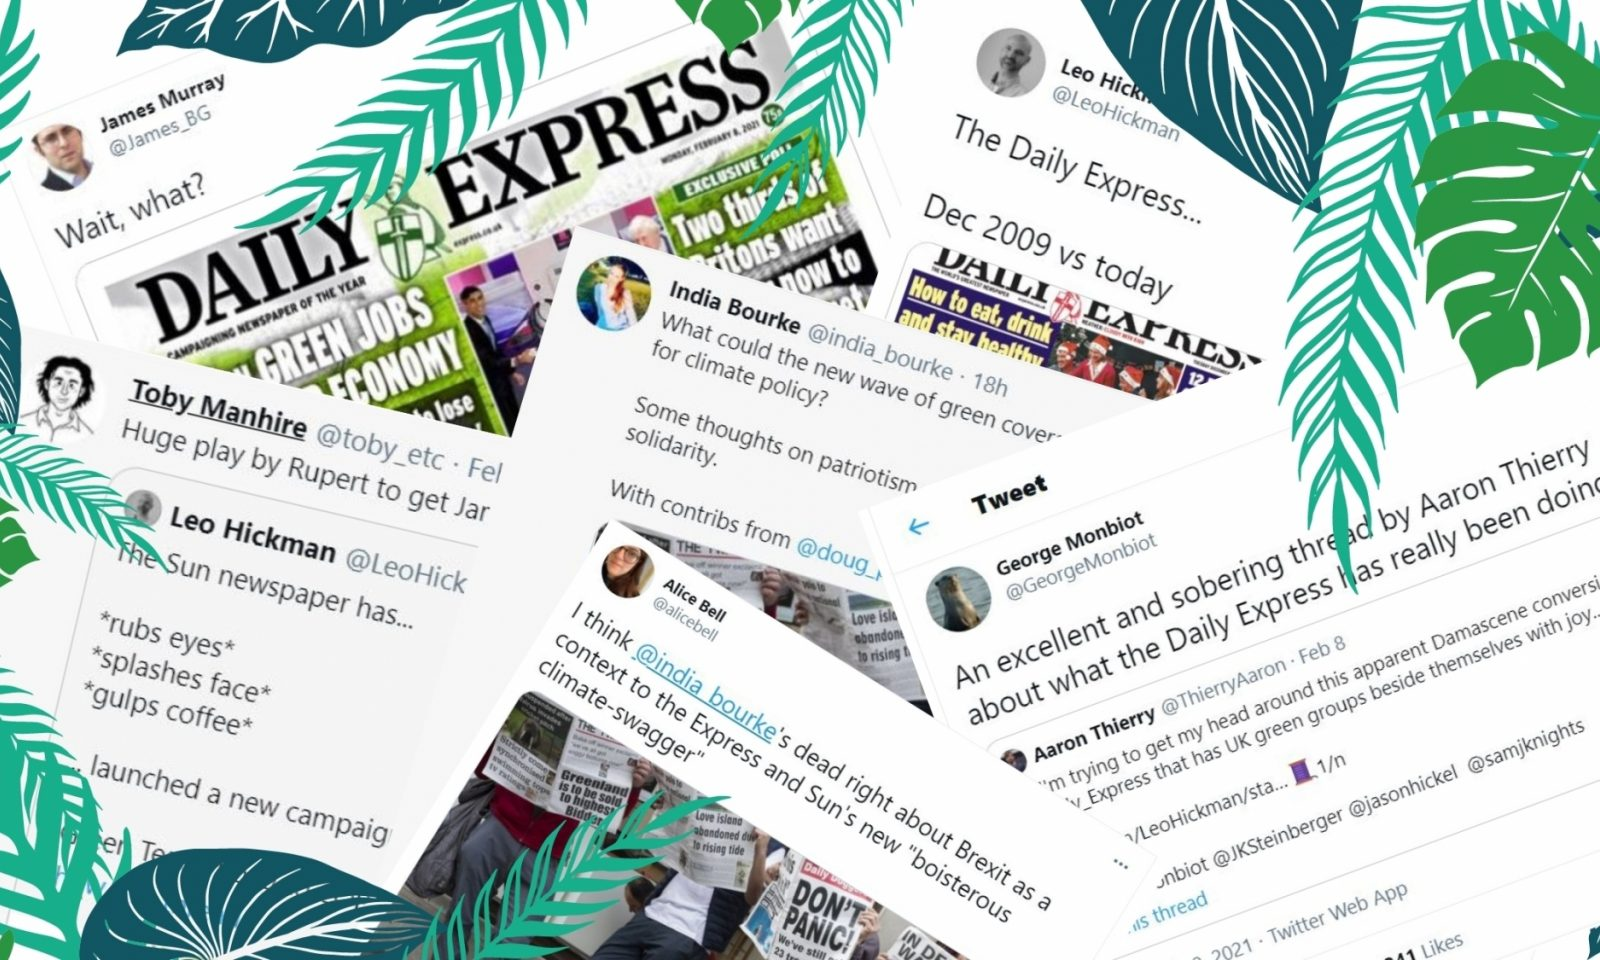 Daily Express Blog Piece